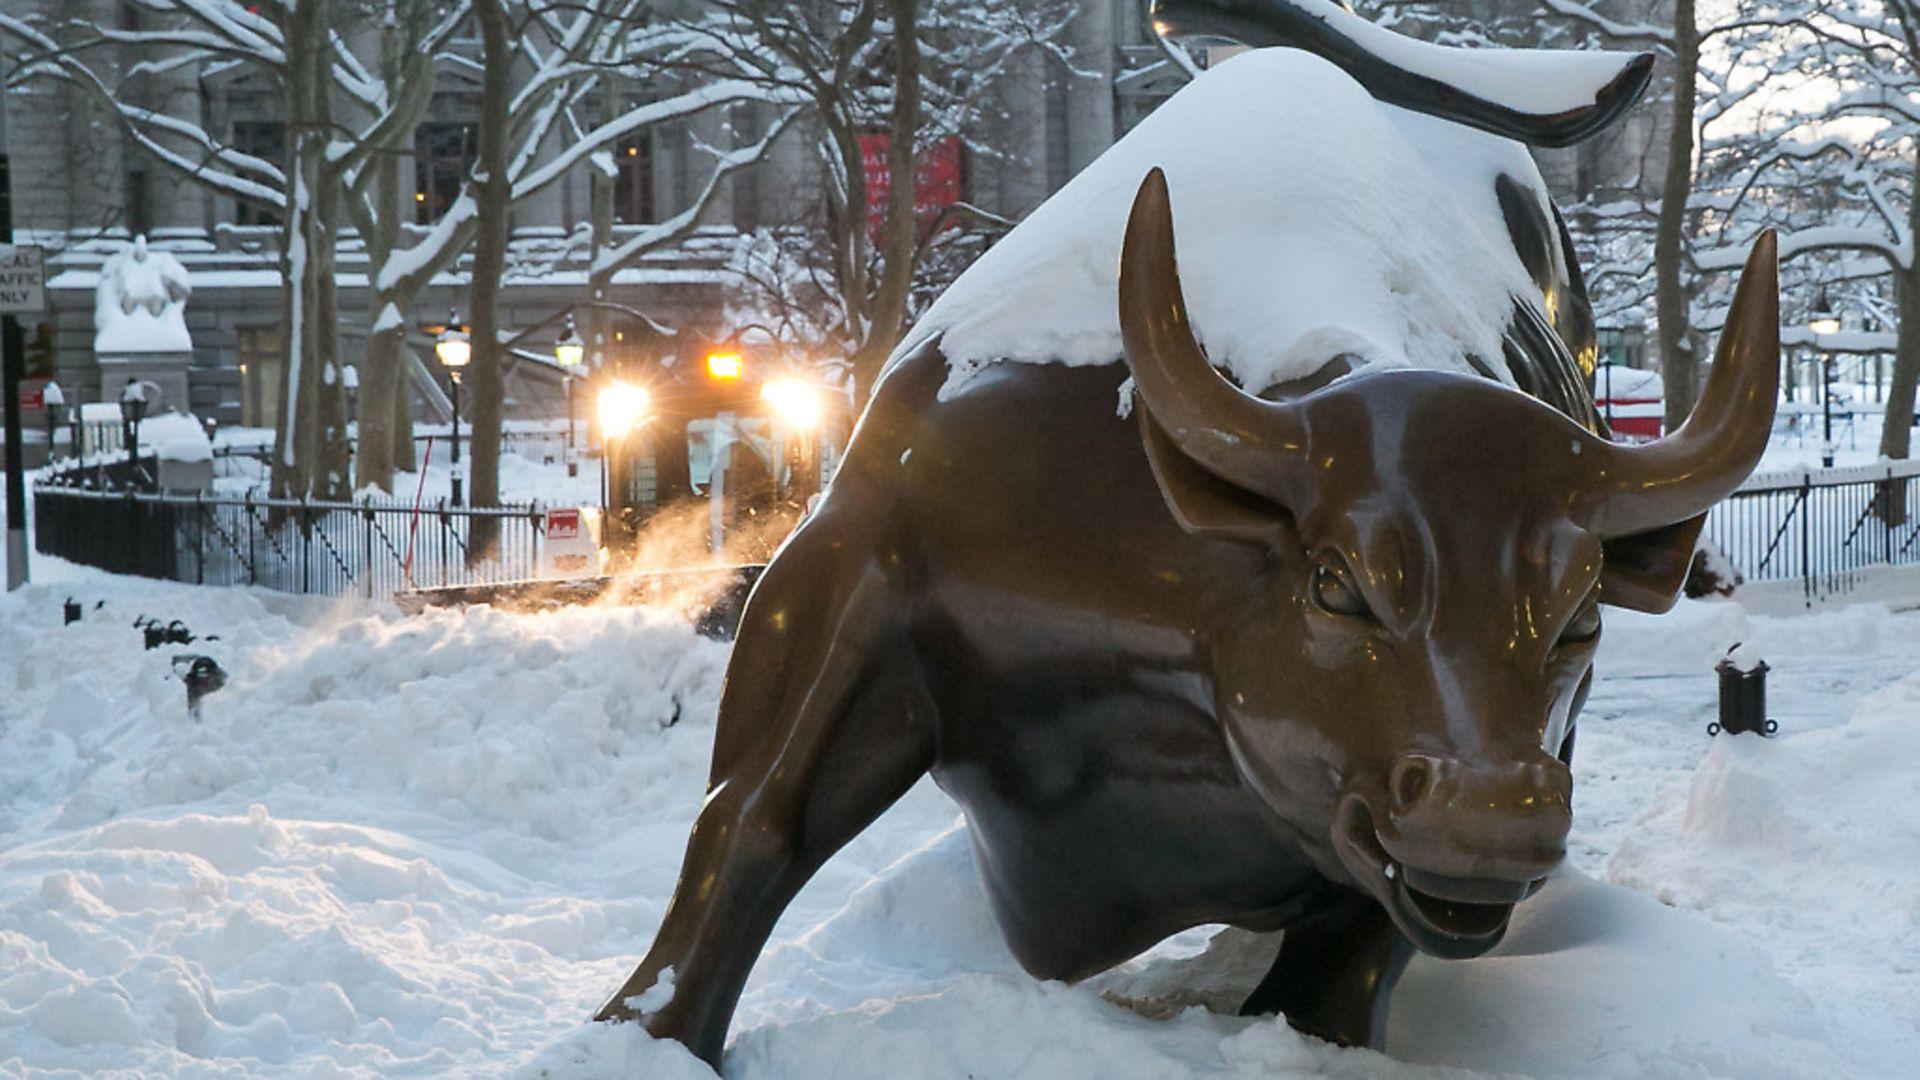 Markets remain bullish but experts are warning ivestors to be cautious   PHOTO: � Beowulf Sheehan/ZUMA Wire) - Credit: Zuma Press/PA Images